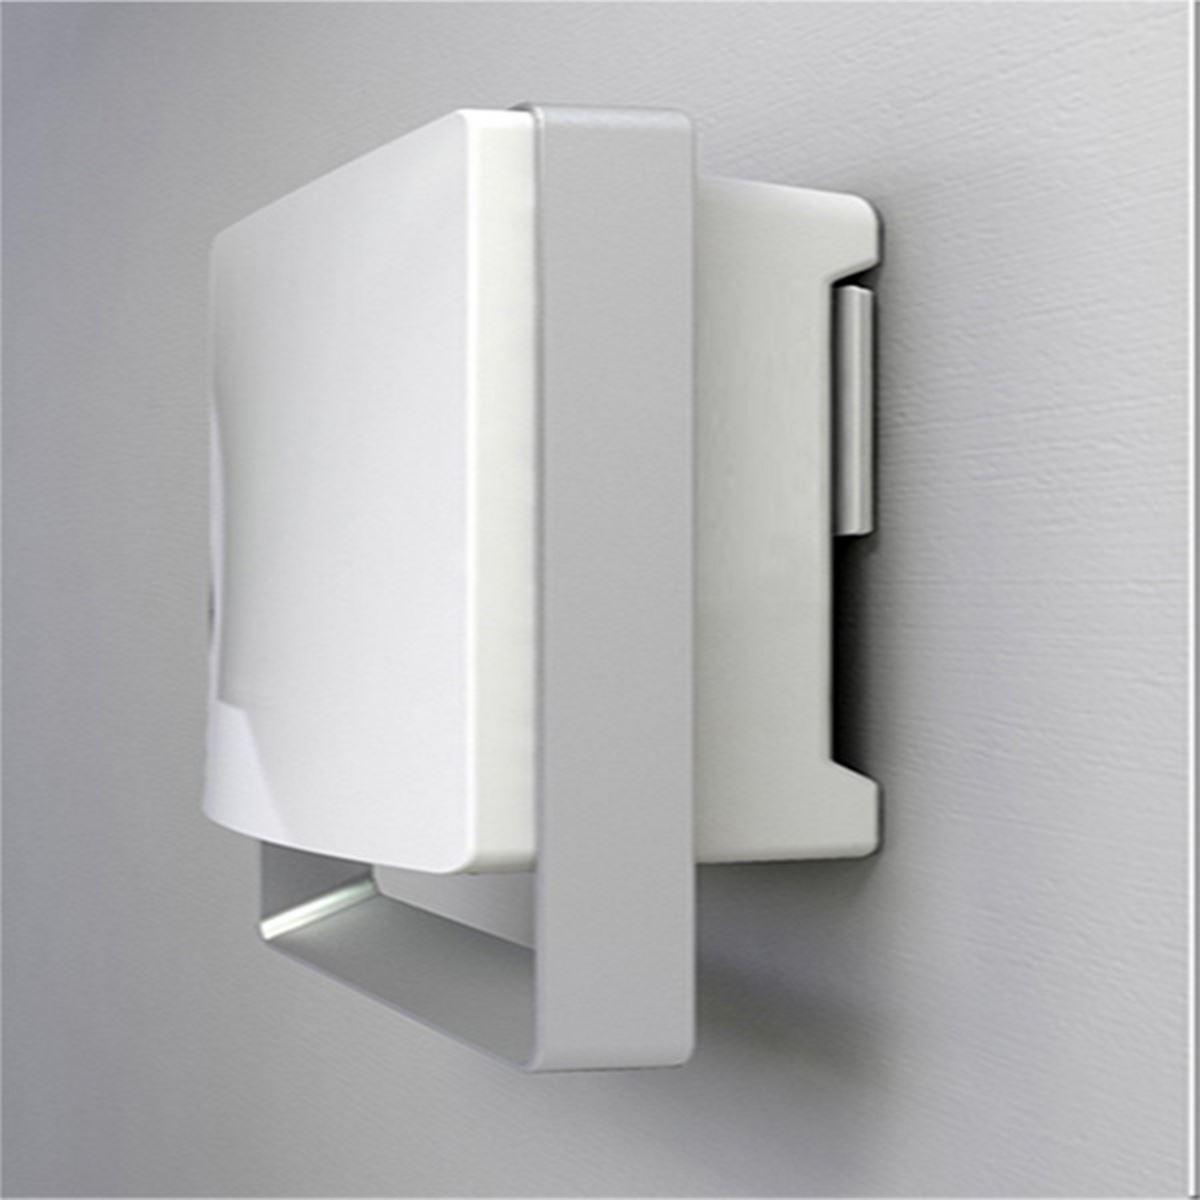 photo radiateur electrique 500w extra plat. Black Bedroom Furniture Sets. Home Design Ideas